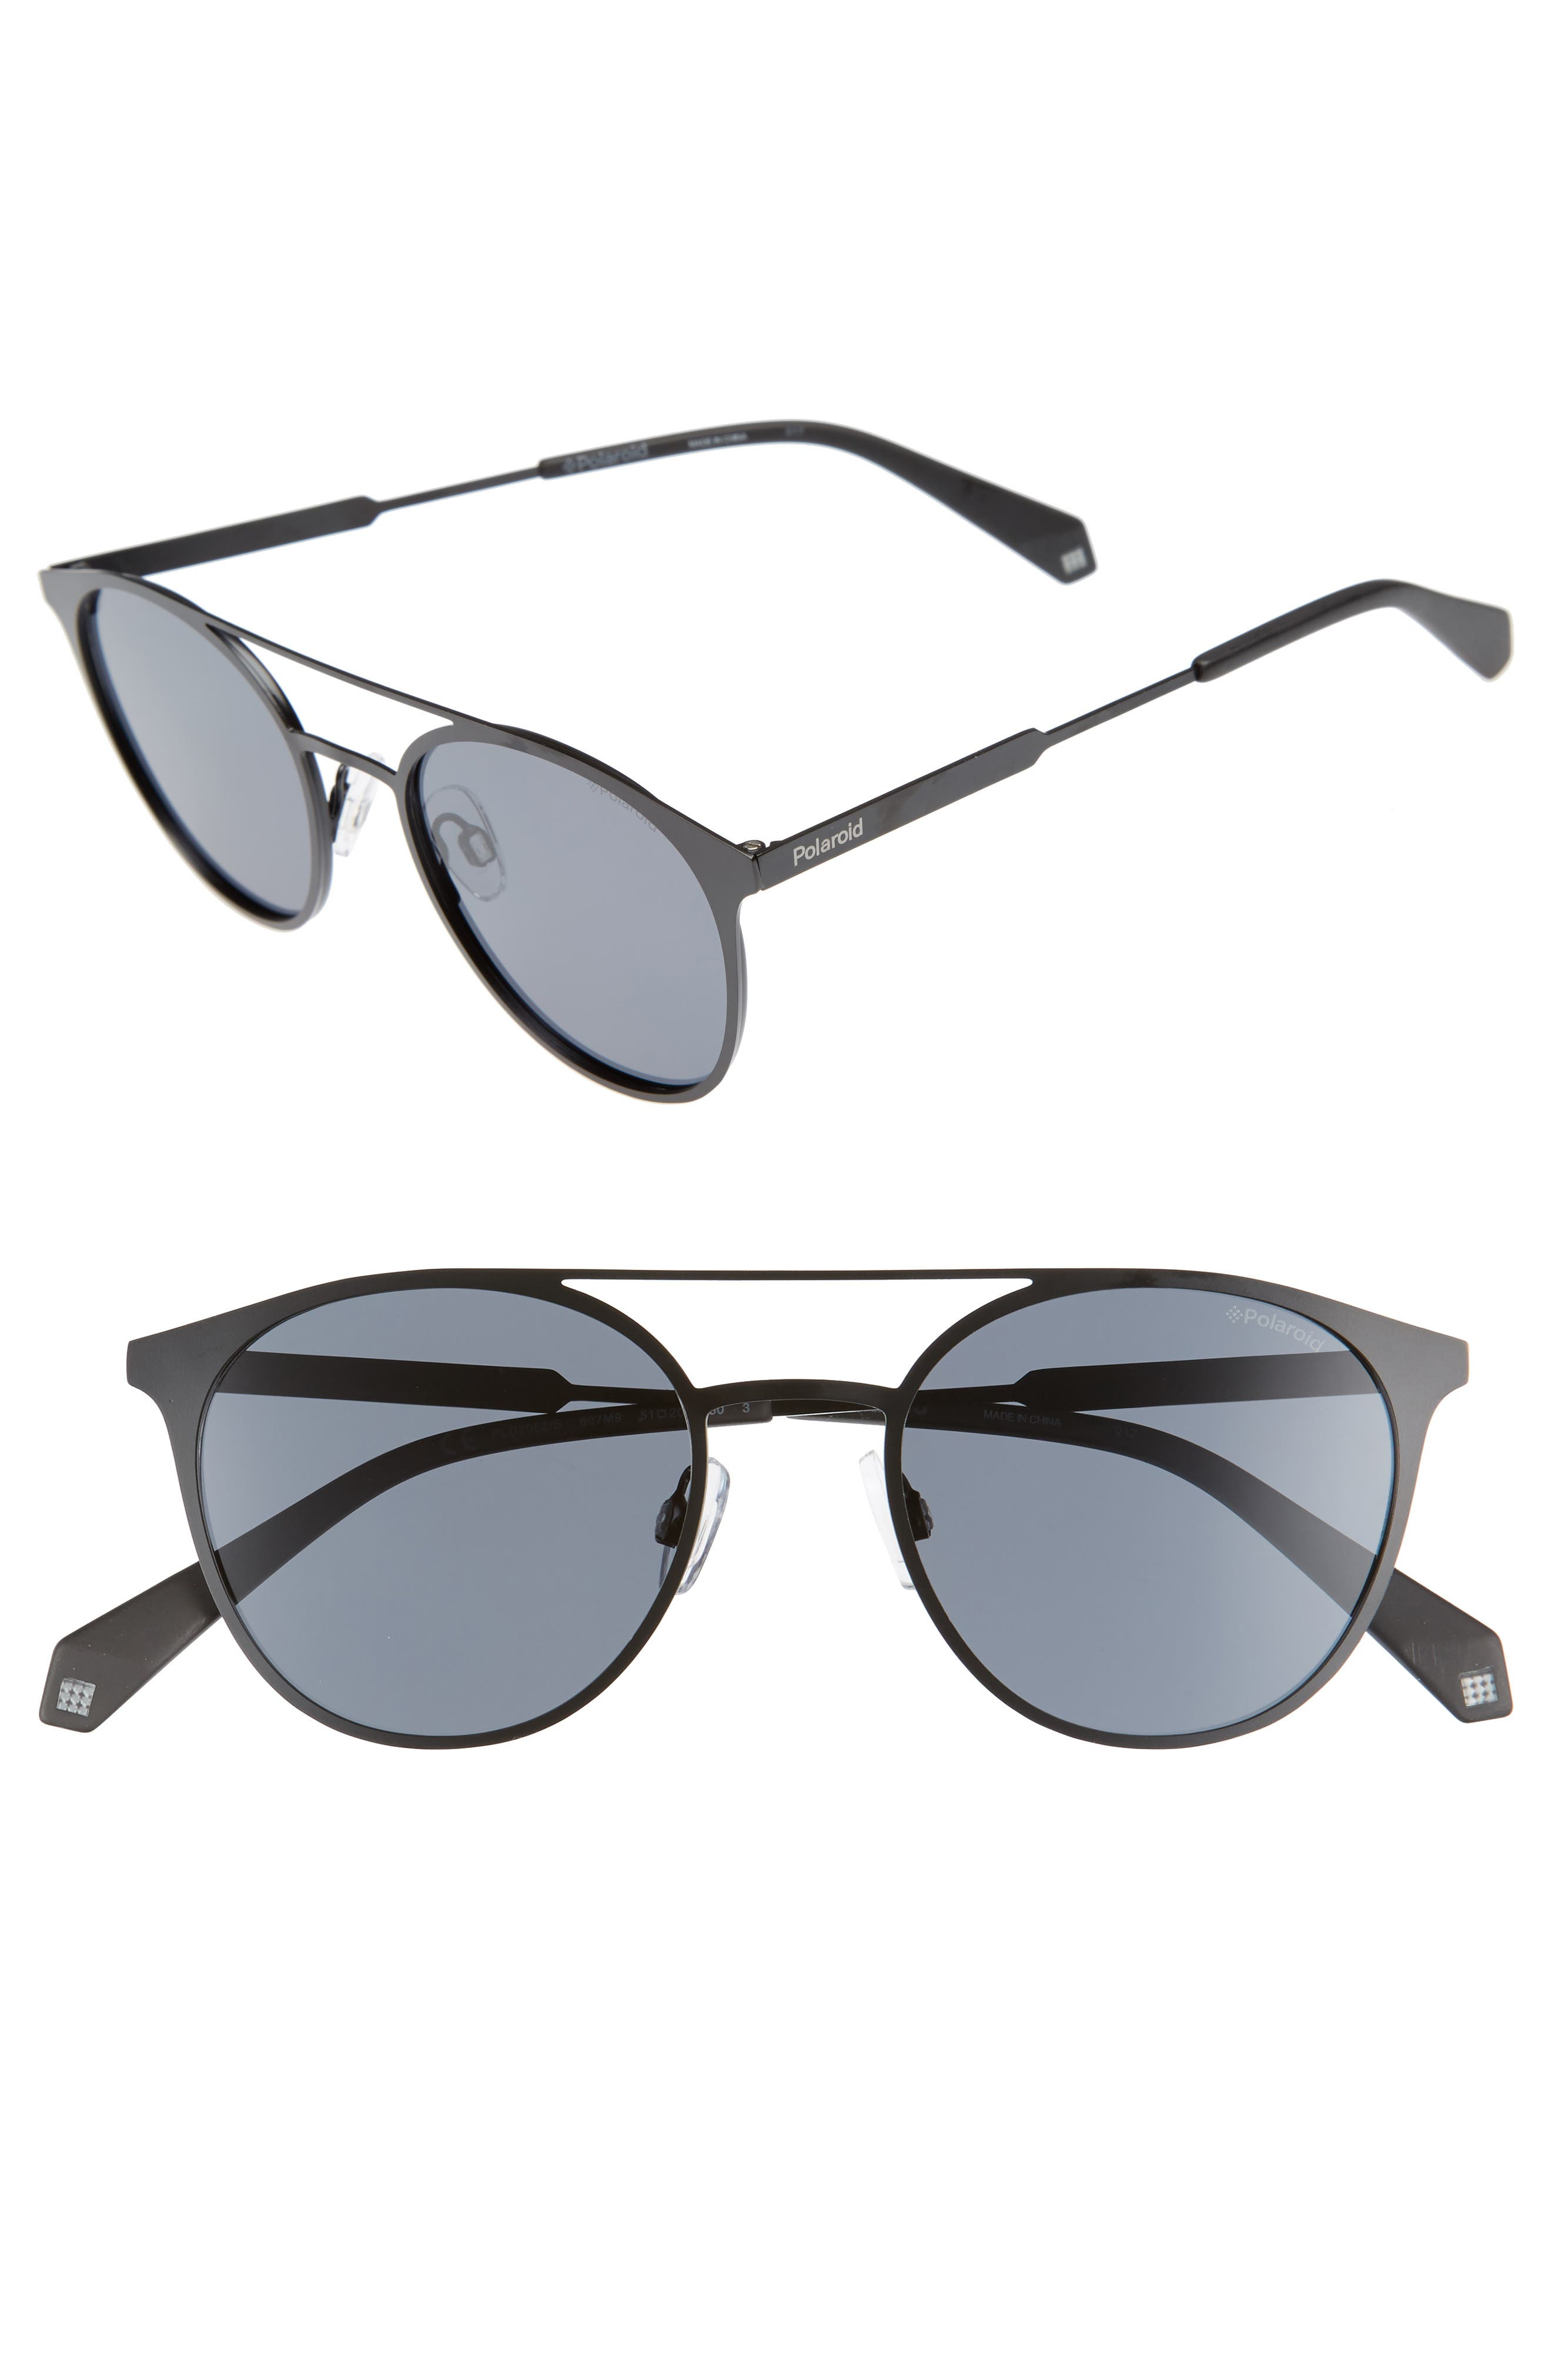 Main Image - Polaroid 51mm Polarized Round Stainless Steel Sunglasses